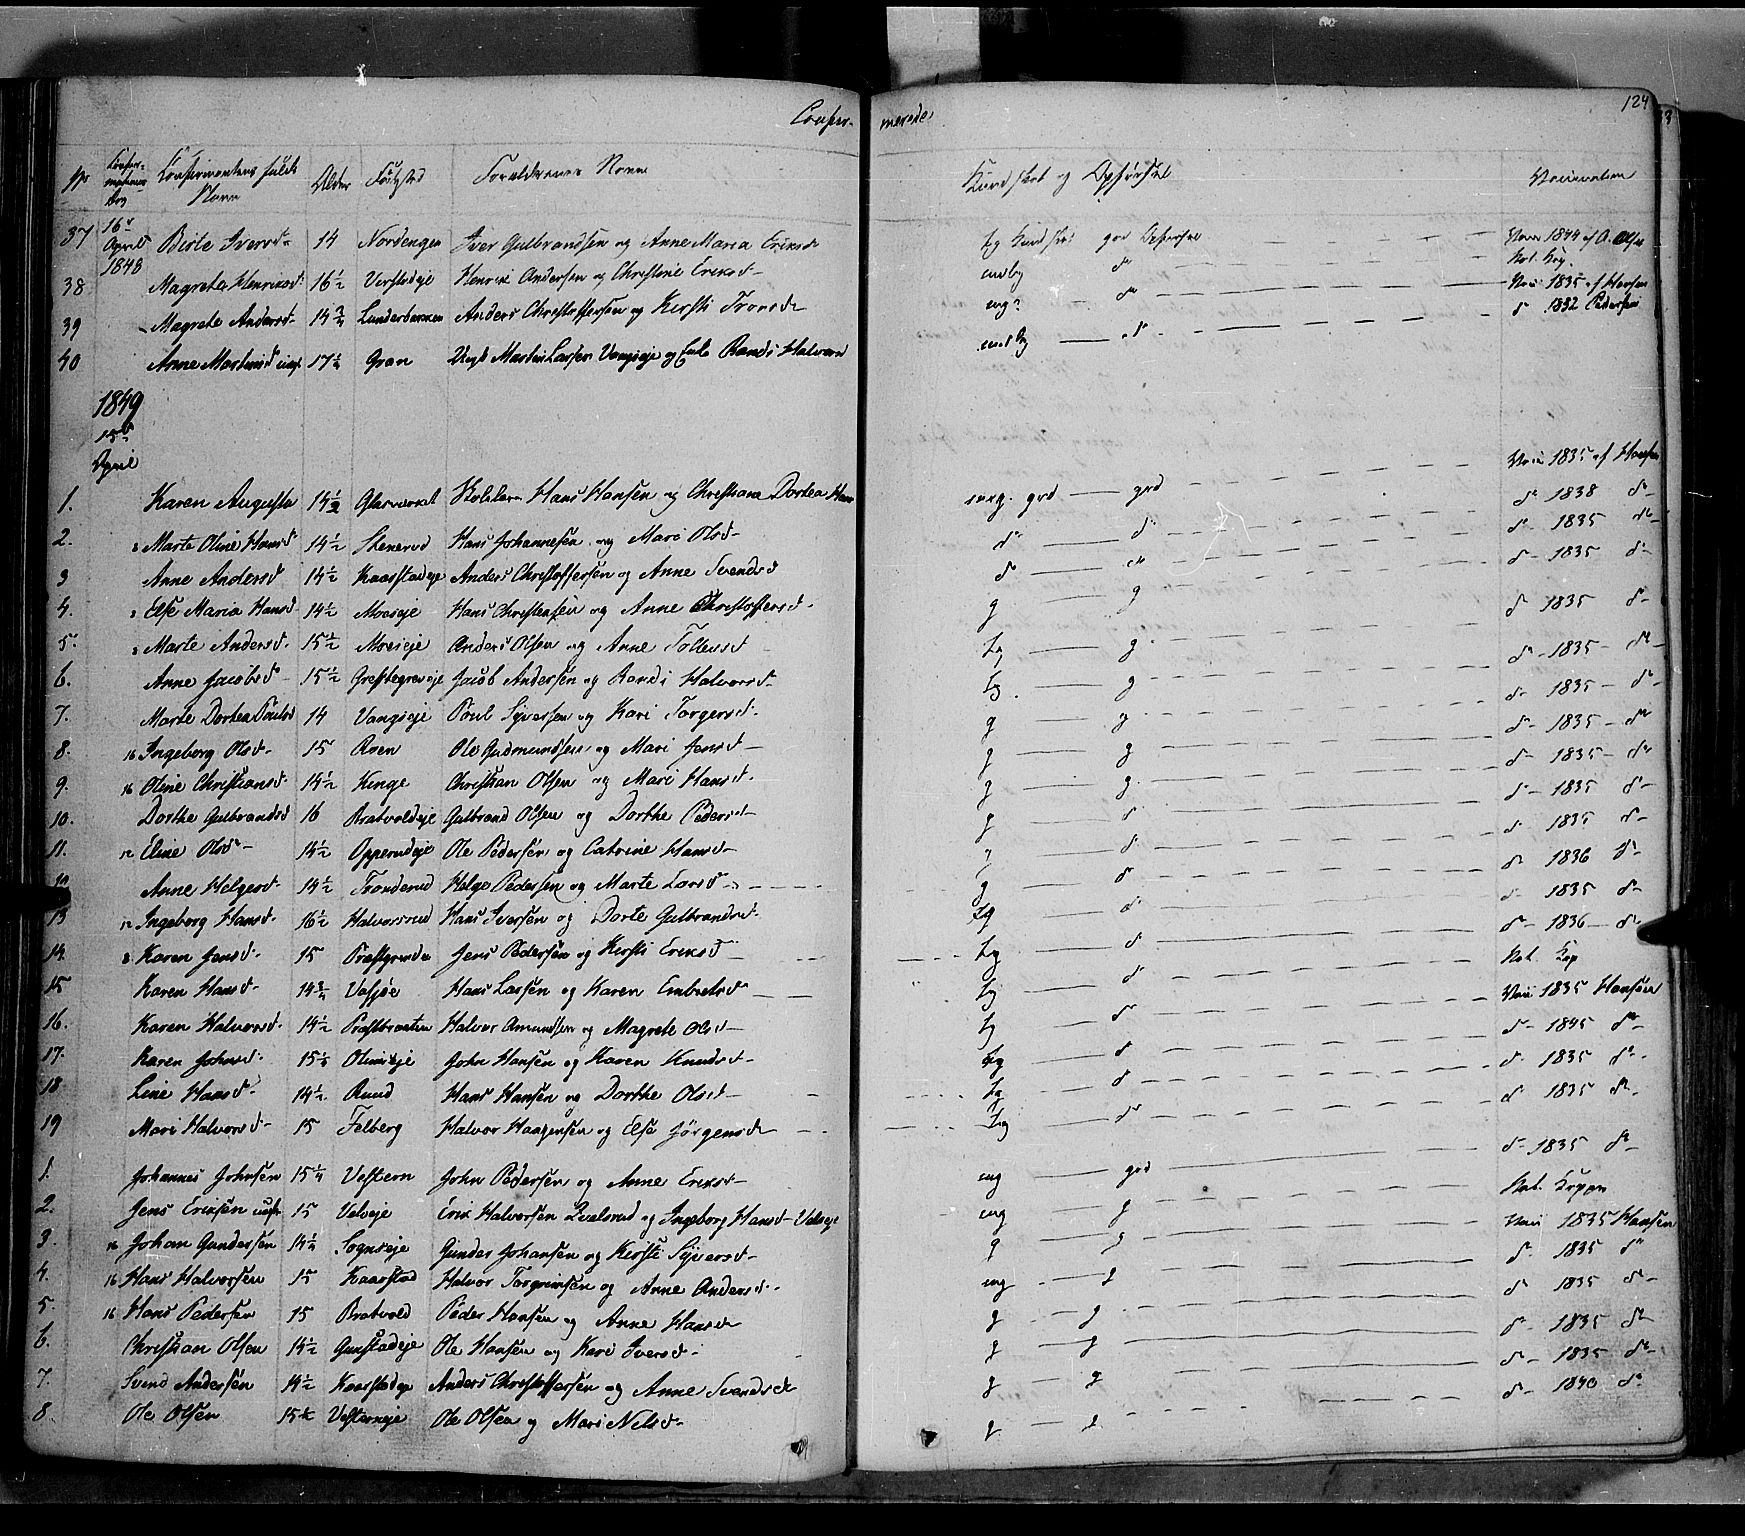 SAH, Jevnaker prestekontor, Ministerialbok nr. 6, 1837-1857, s. 124